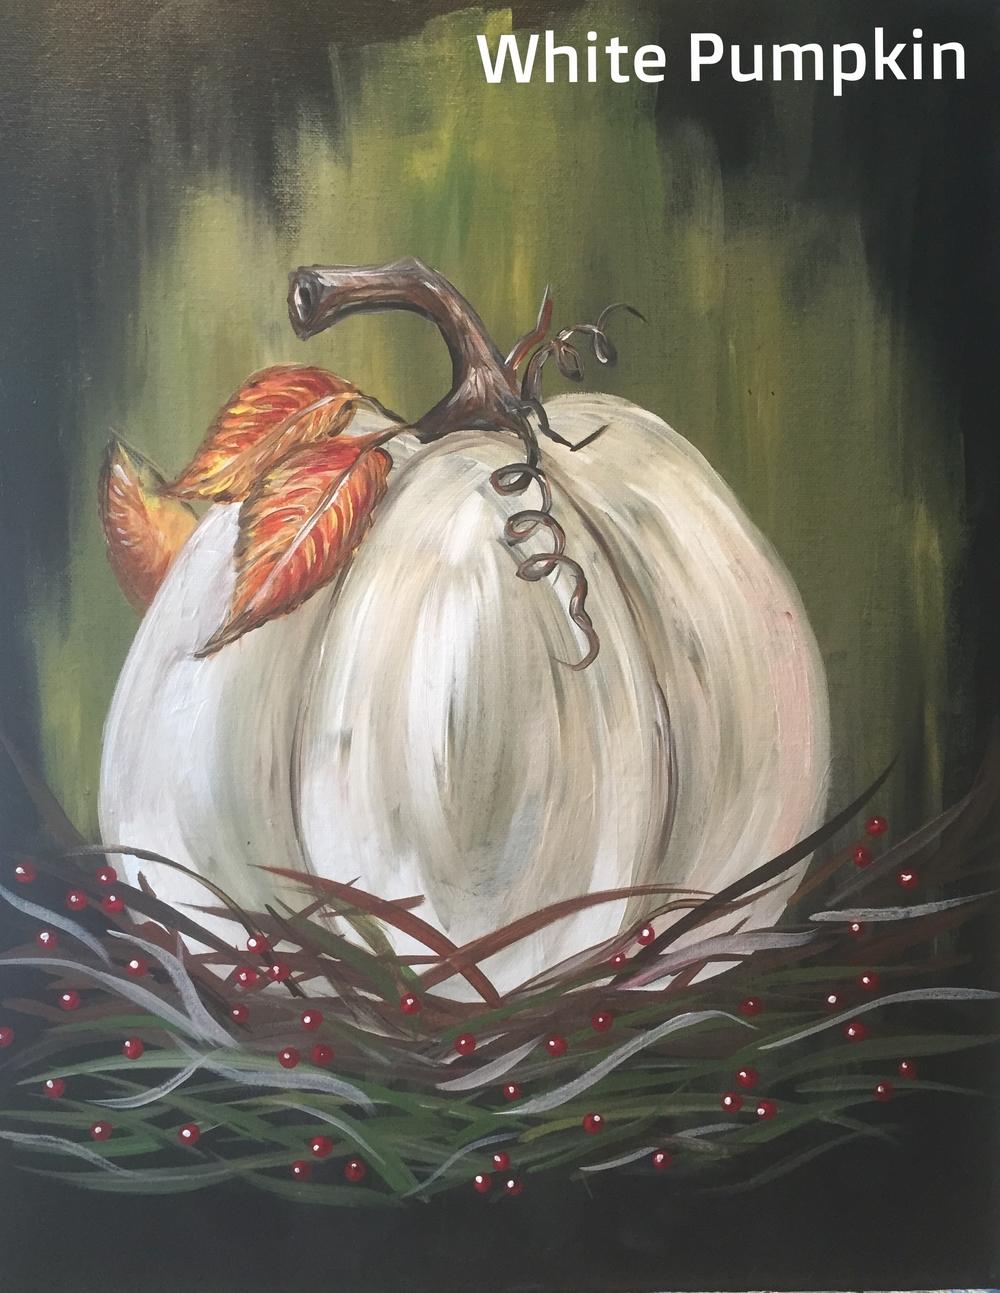 White Pumpkin SH.jpg